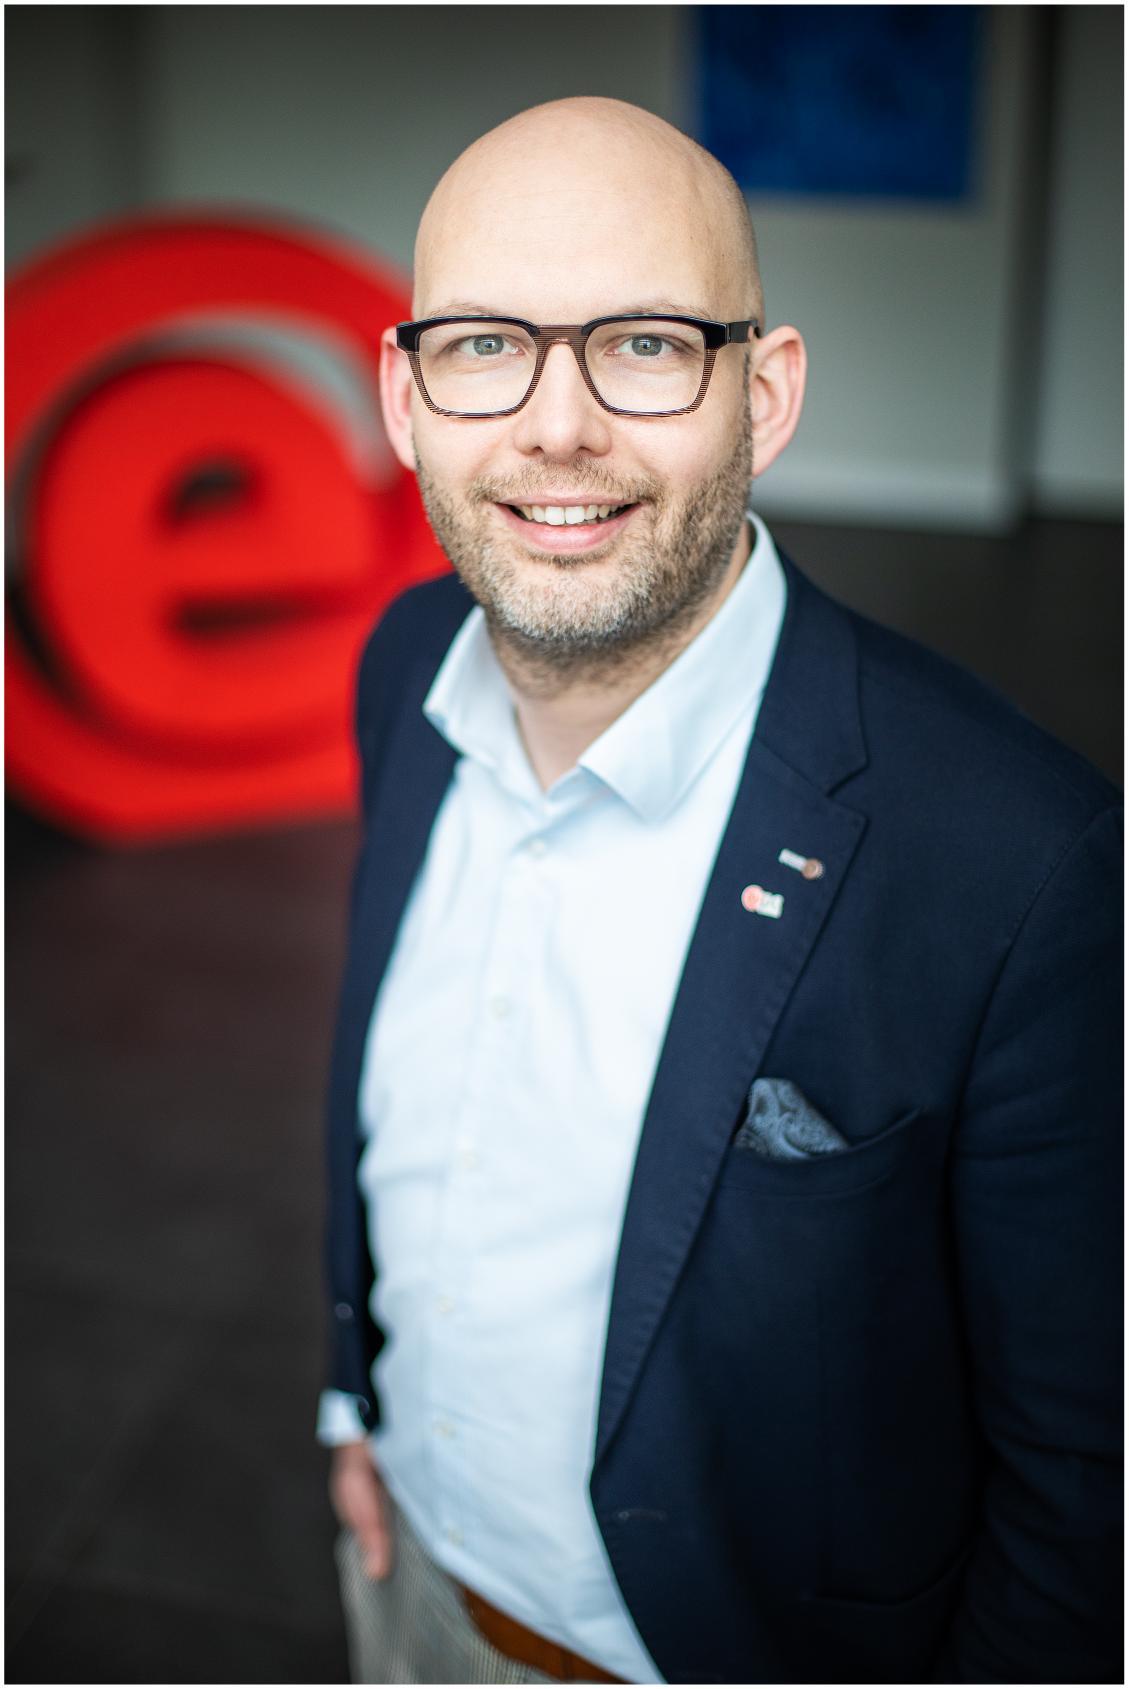 Frederik Eggers